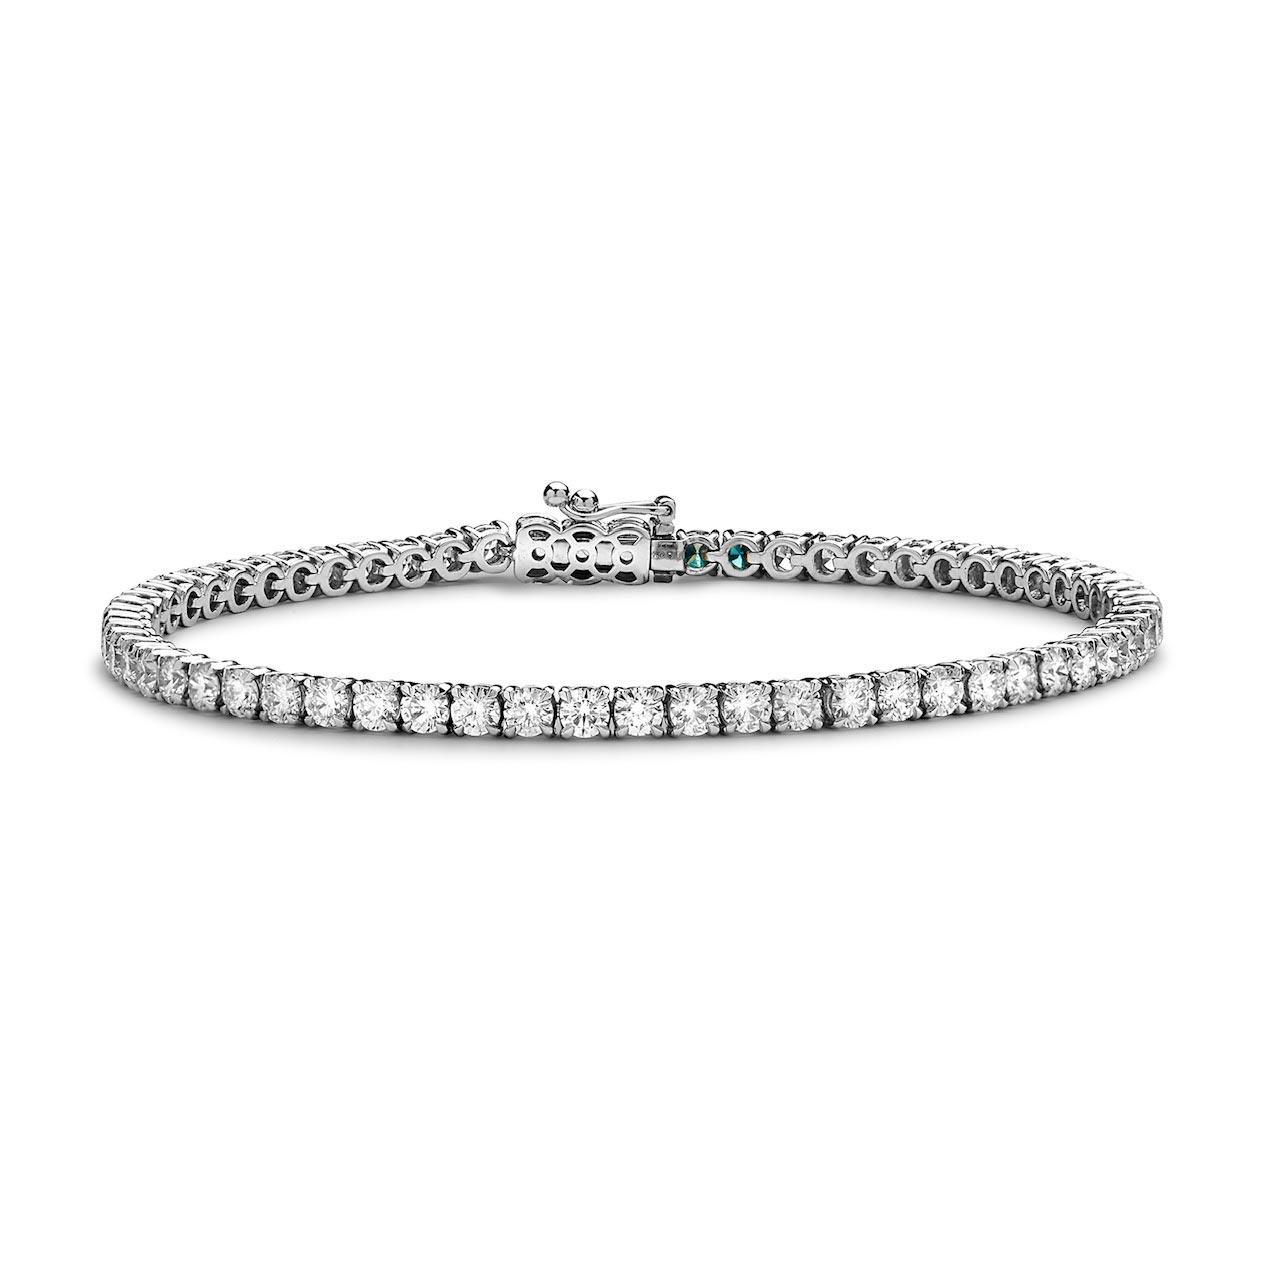 Humphreys London Platinum and Diamond Bracelet